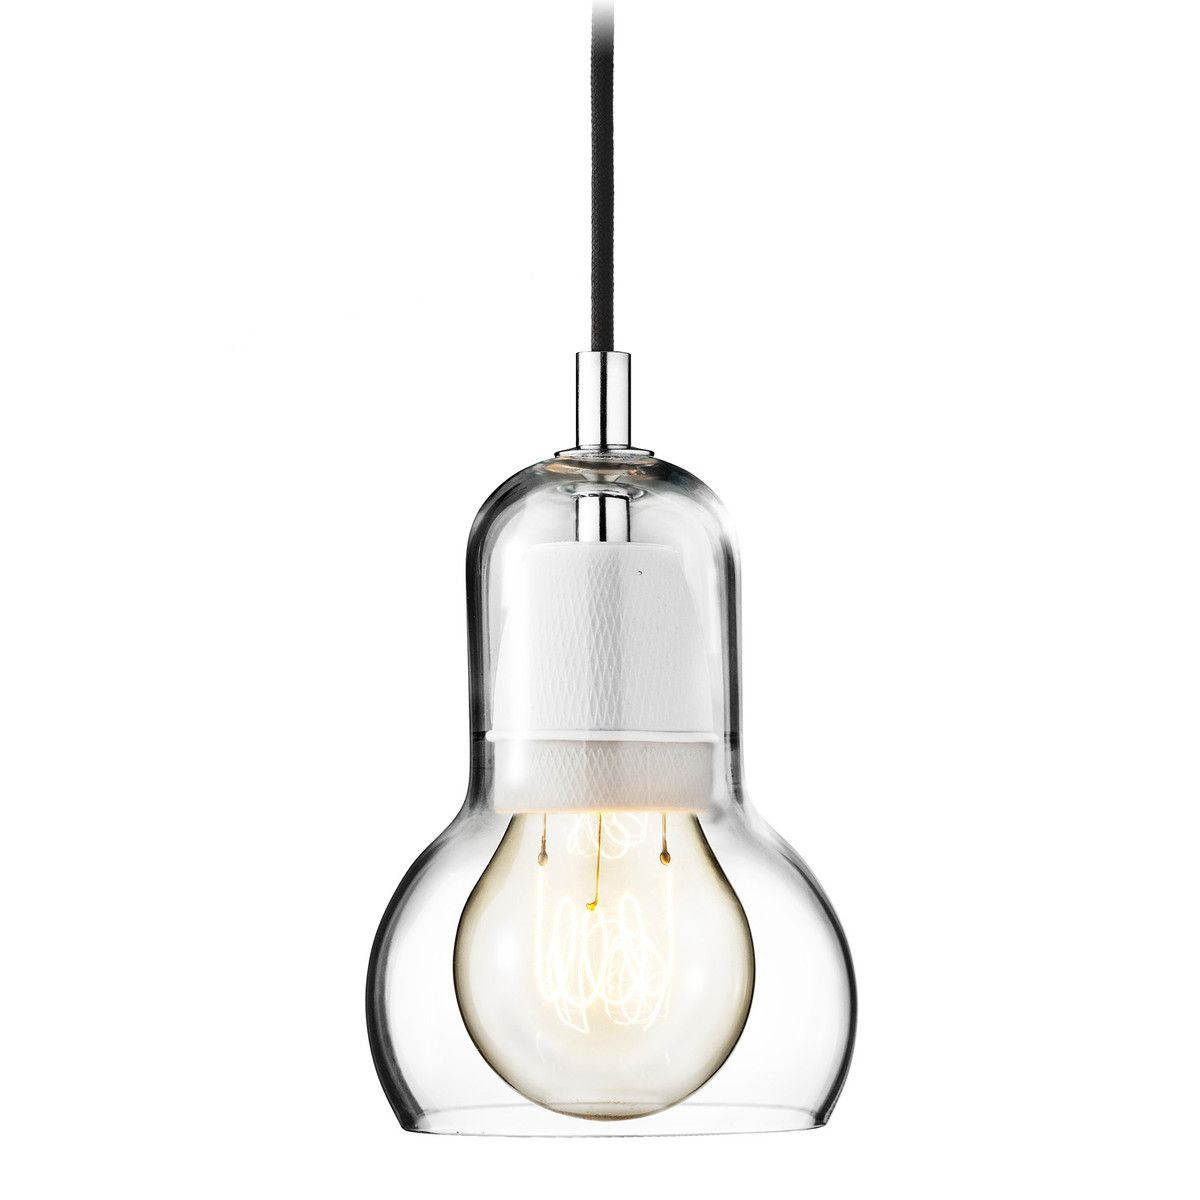 &Tradition - Bulb Pendant Lamp, SR1, clear, transparent cable   Küche